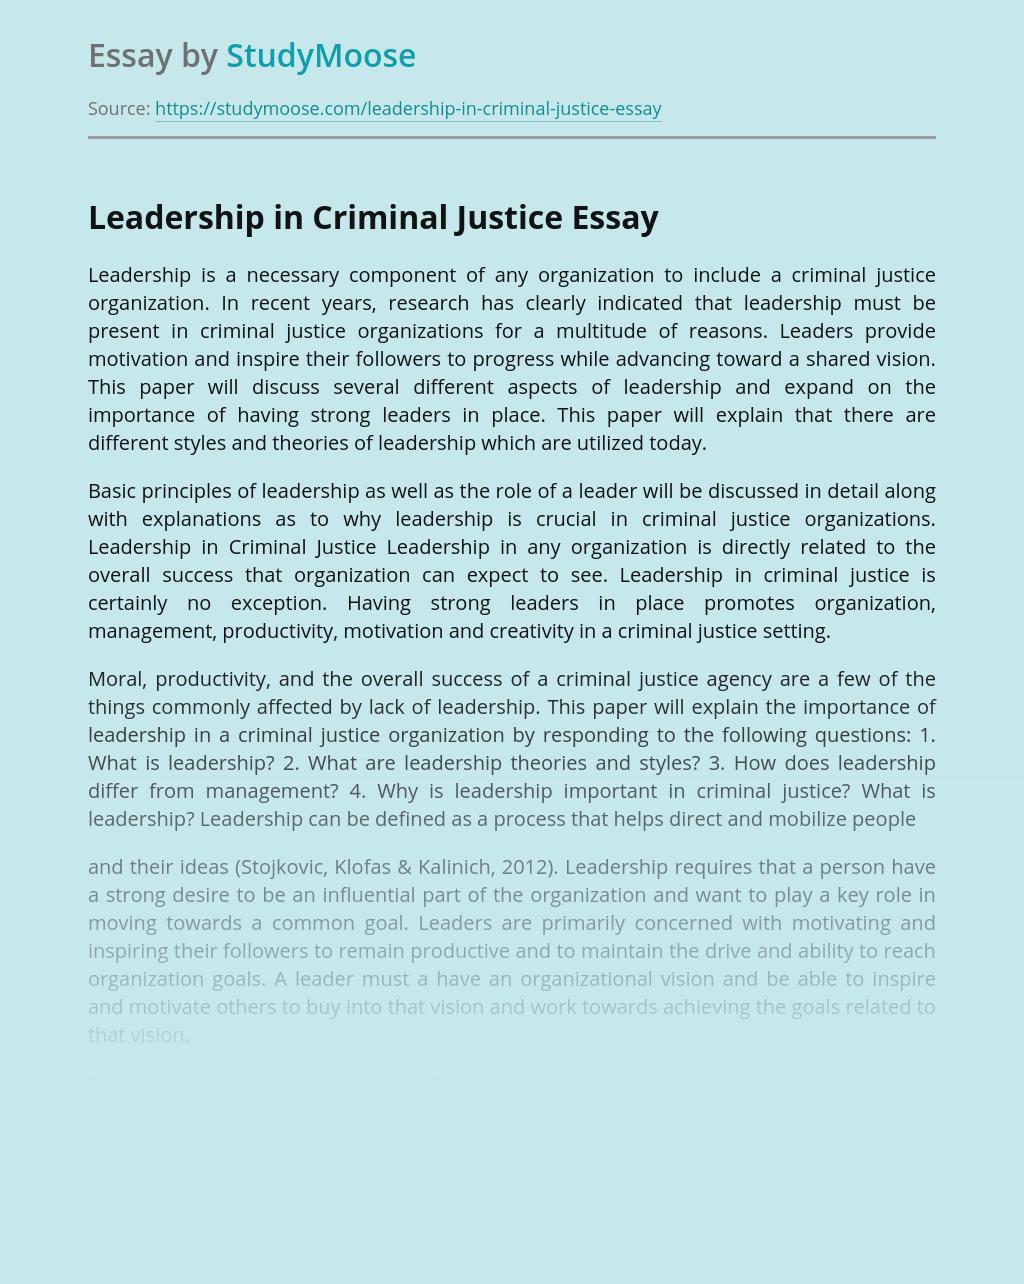 Leadership in Criminal Justice